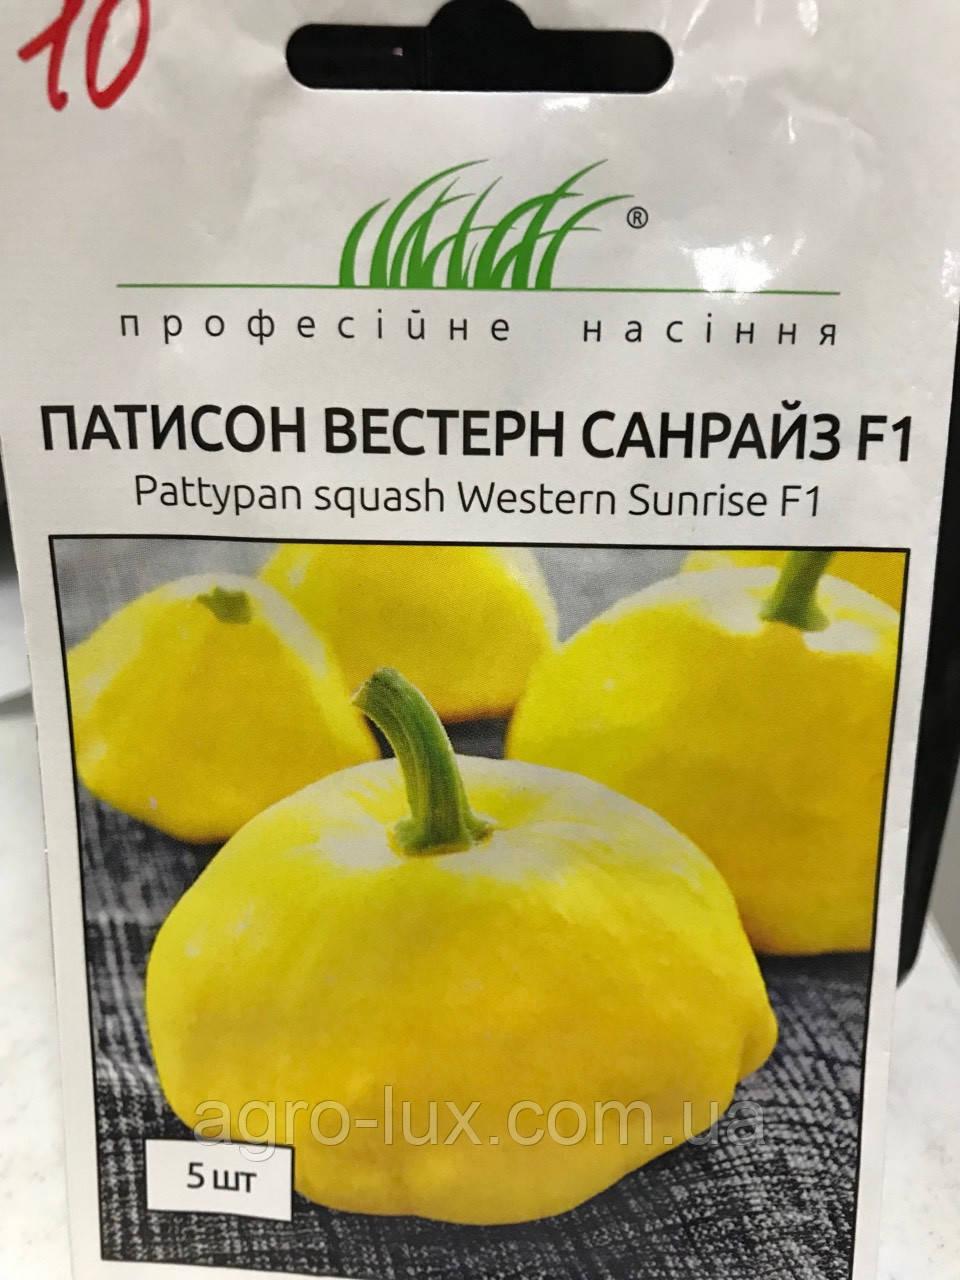 Патисон вестерн Санрайз F1 5 шт